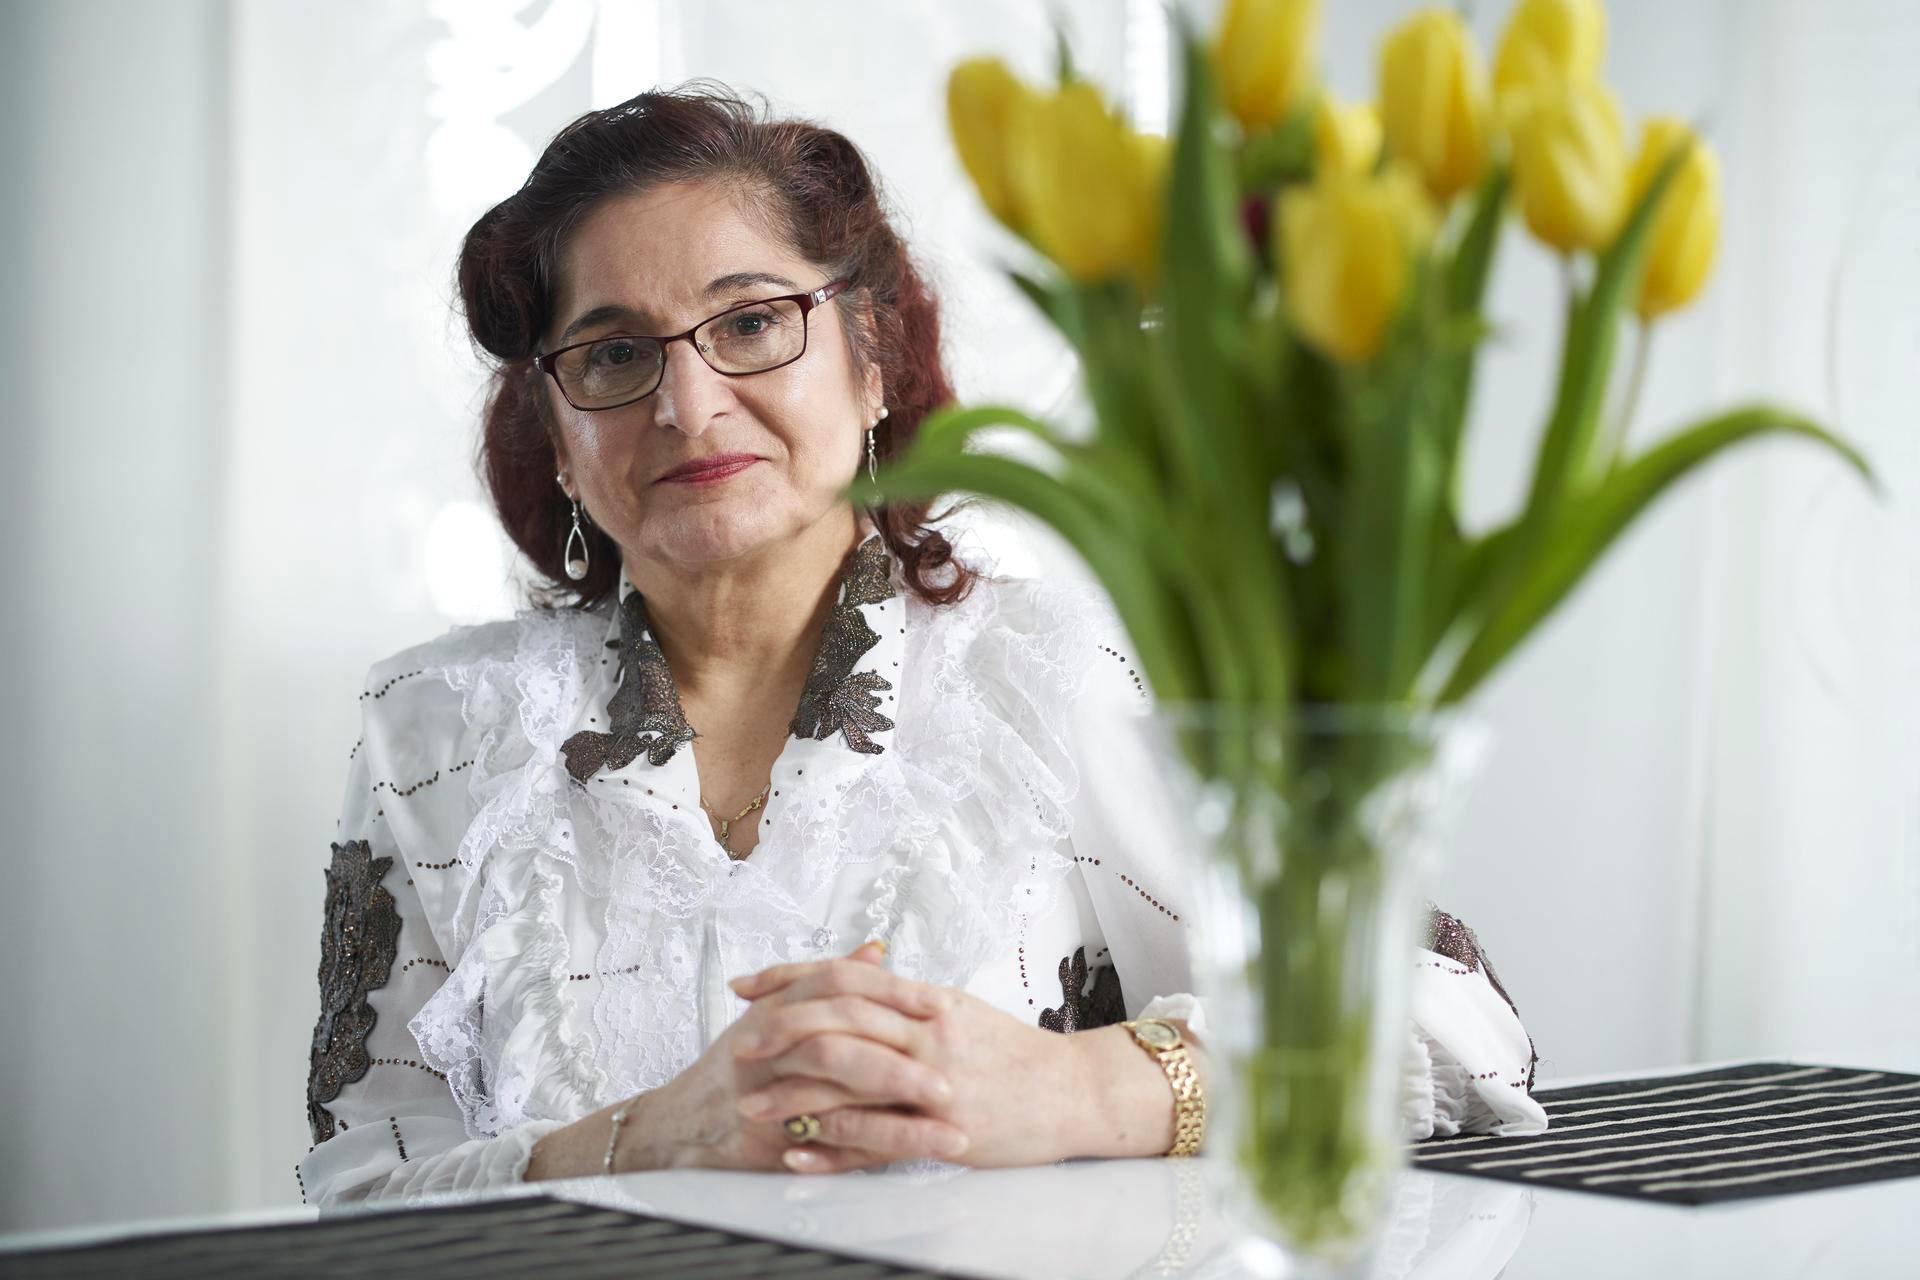 Miranda Vuolasranta